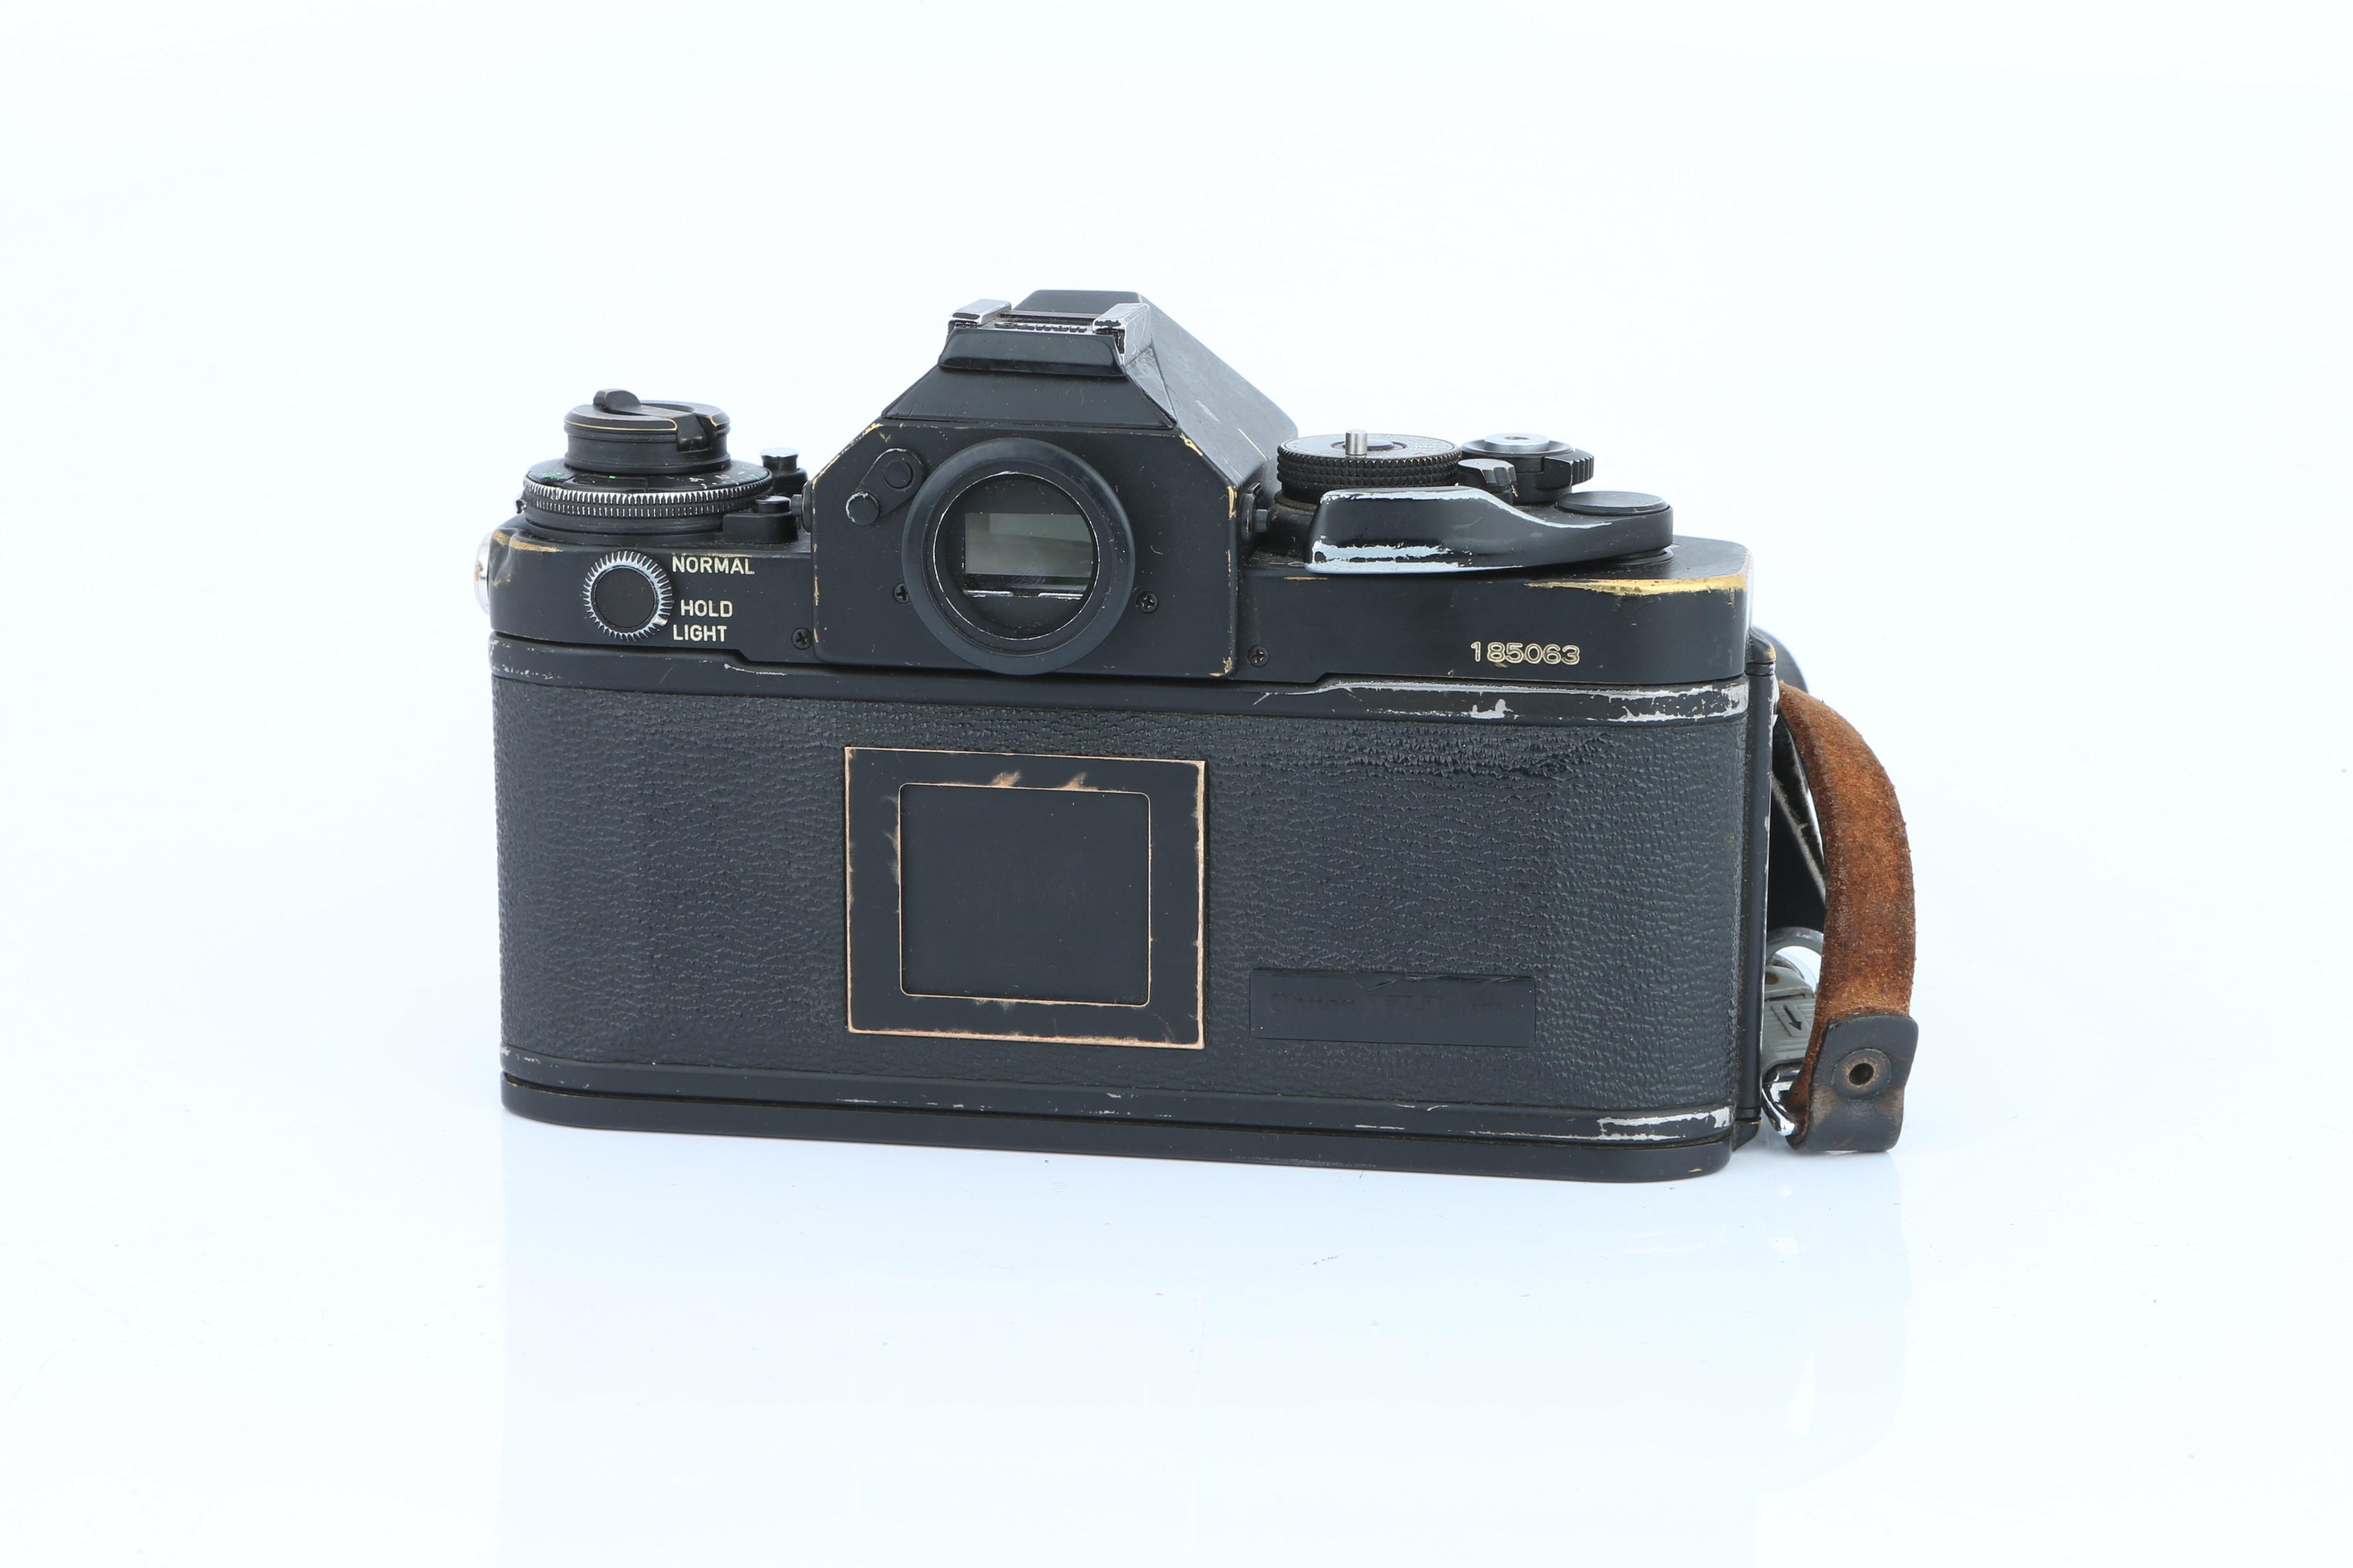 A Canon F-1 New SLR Camera, - Image 2 of 3